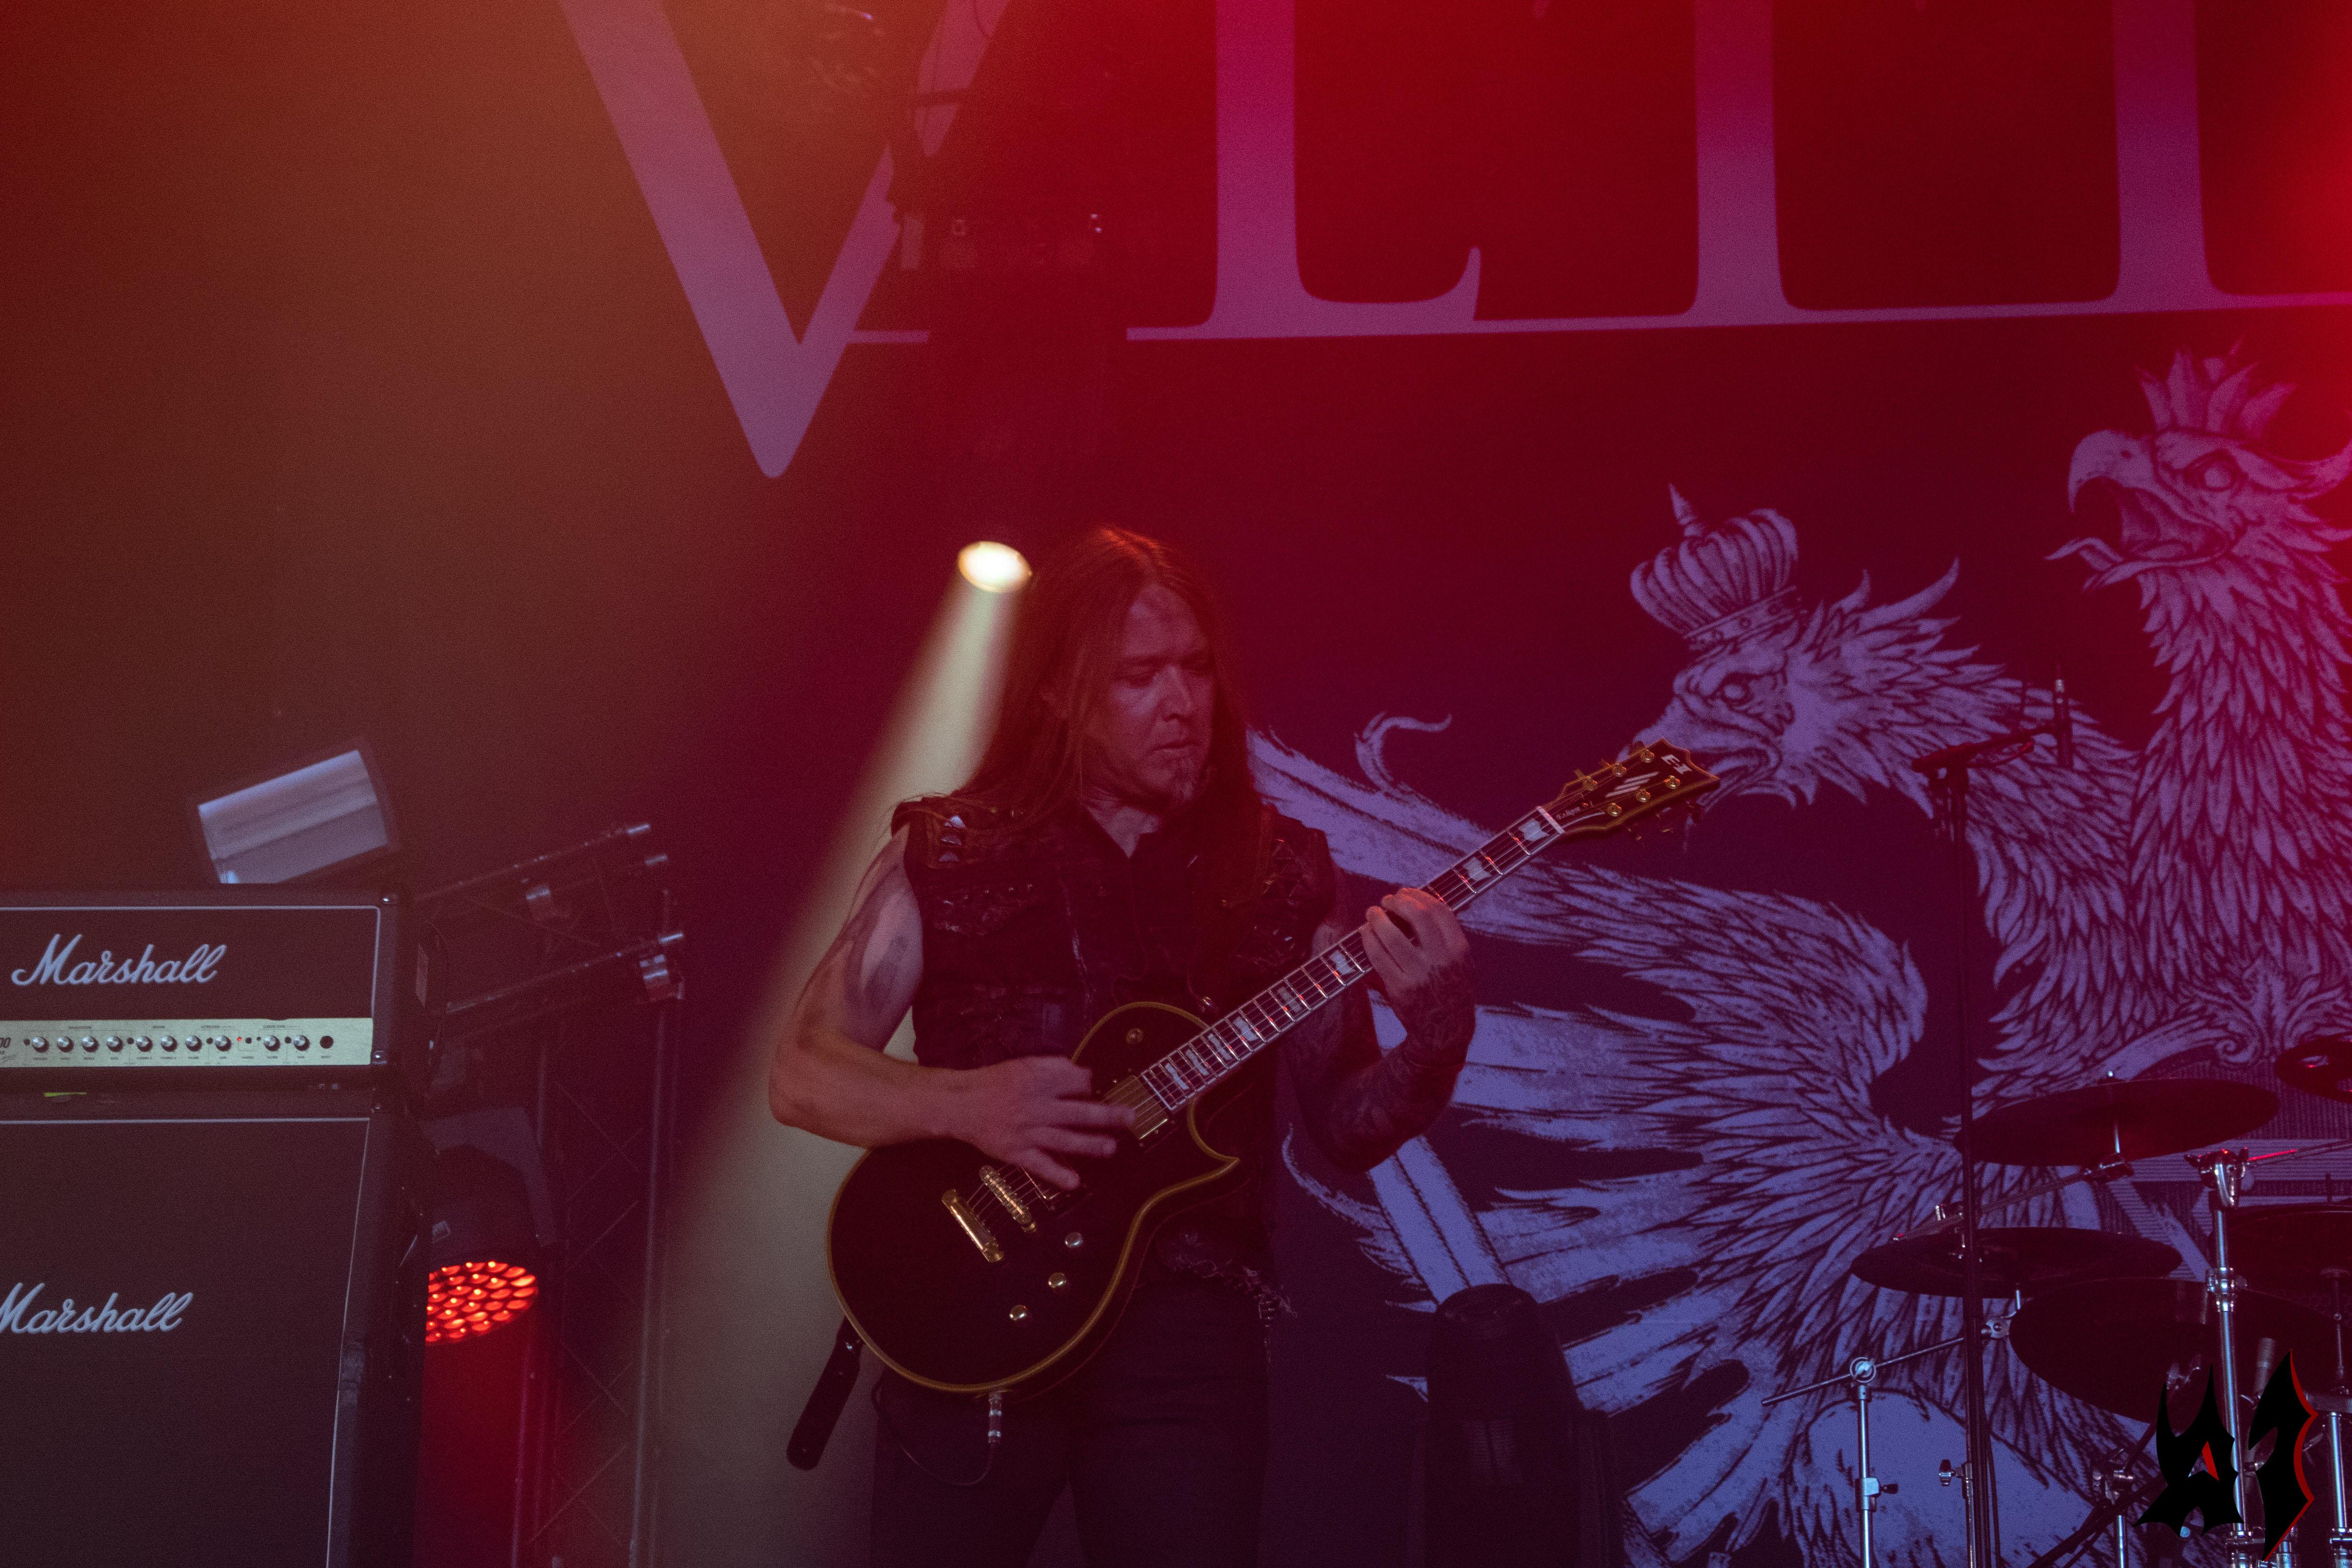 Hellfest - Vltimas - 3